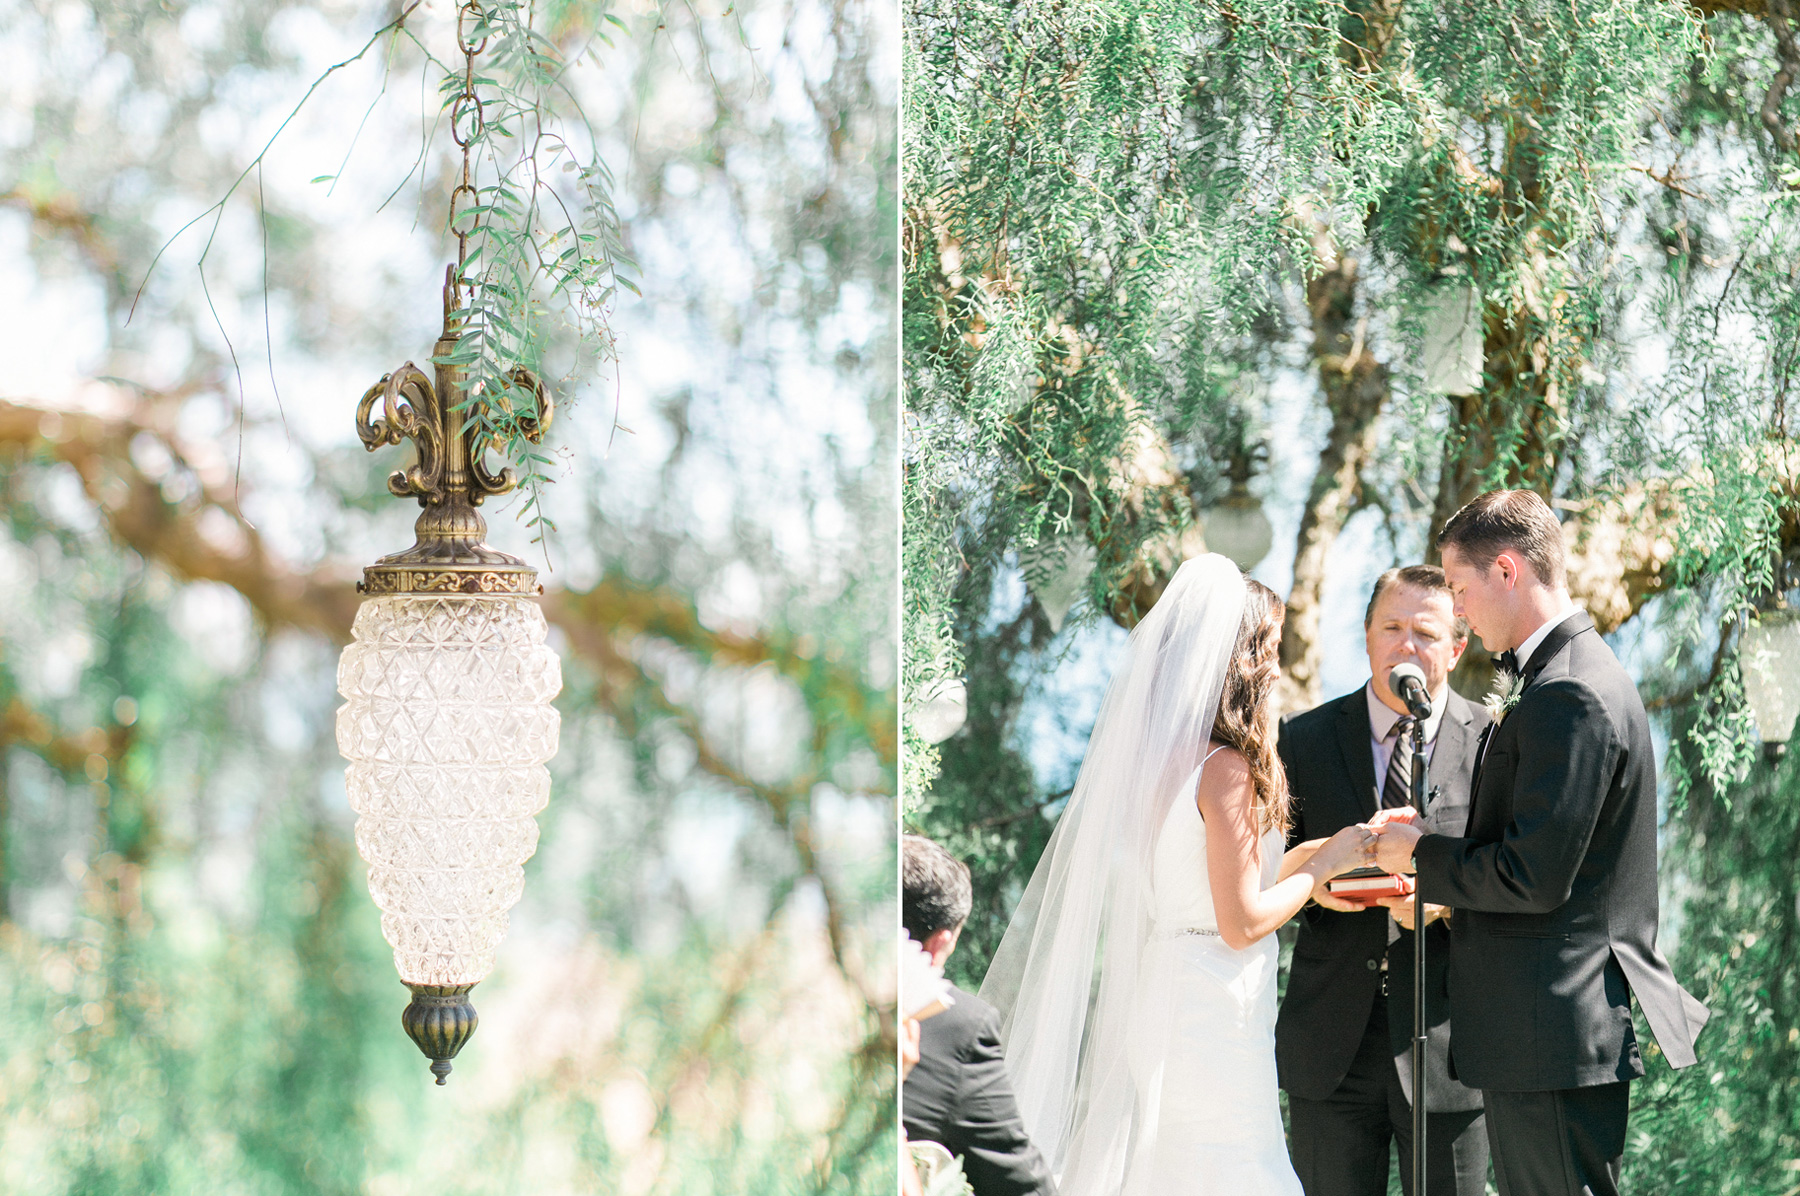 Catalina-View-Gardens-Wedding-25